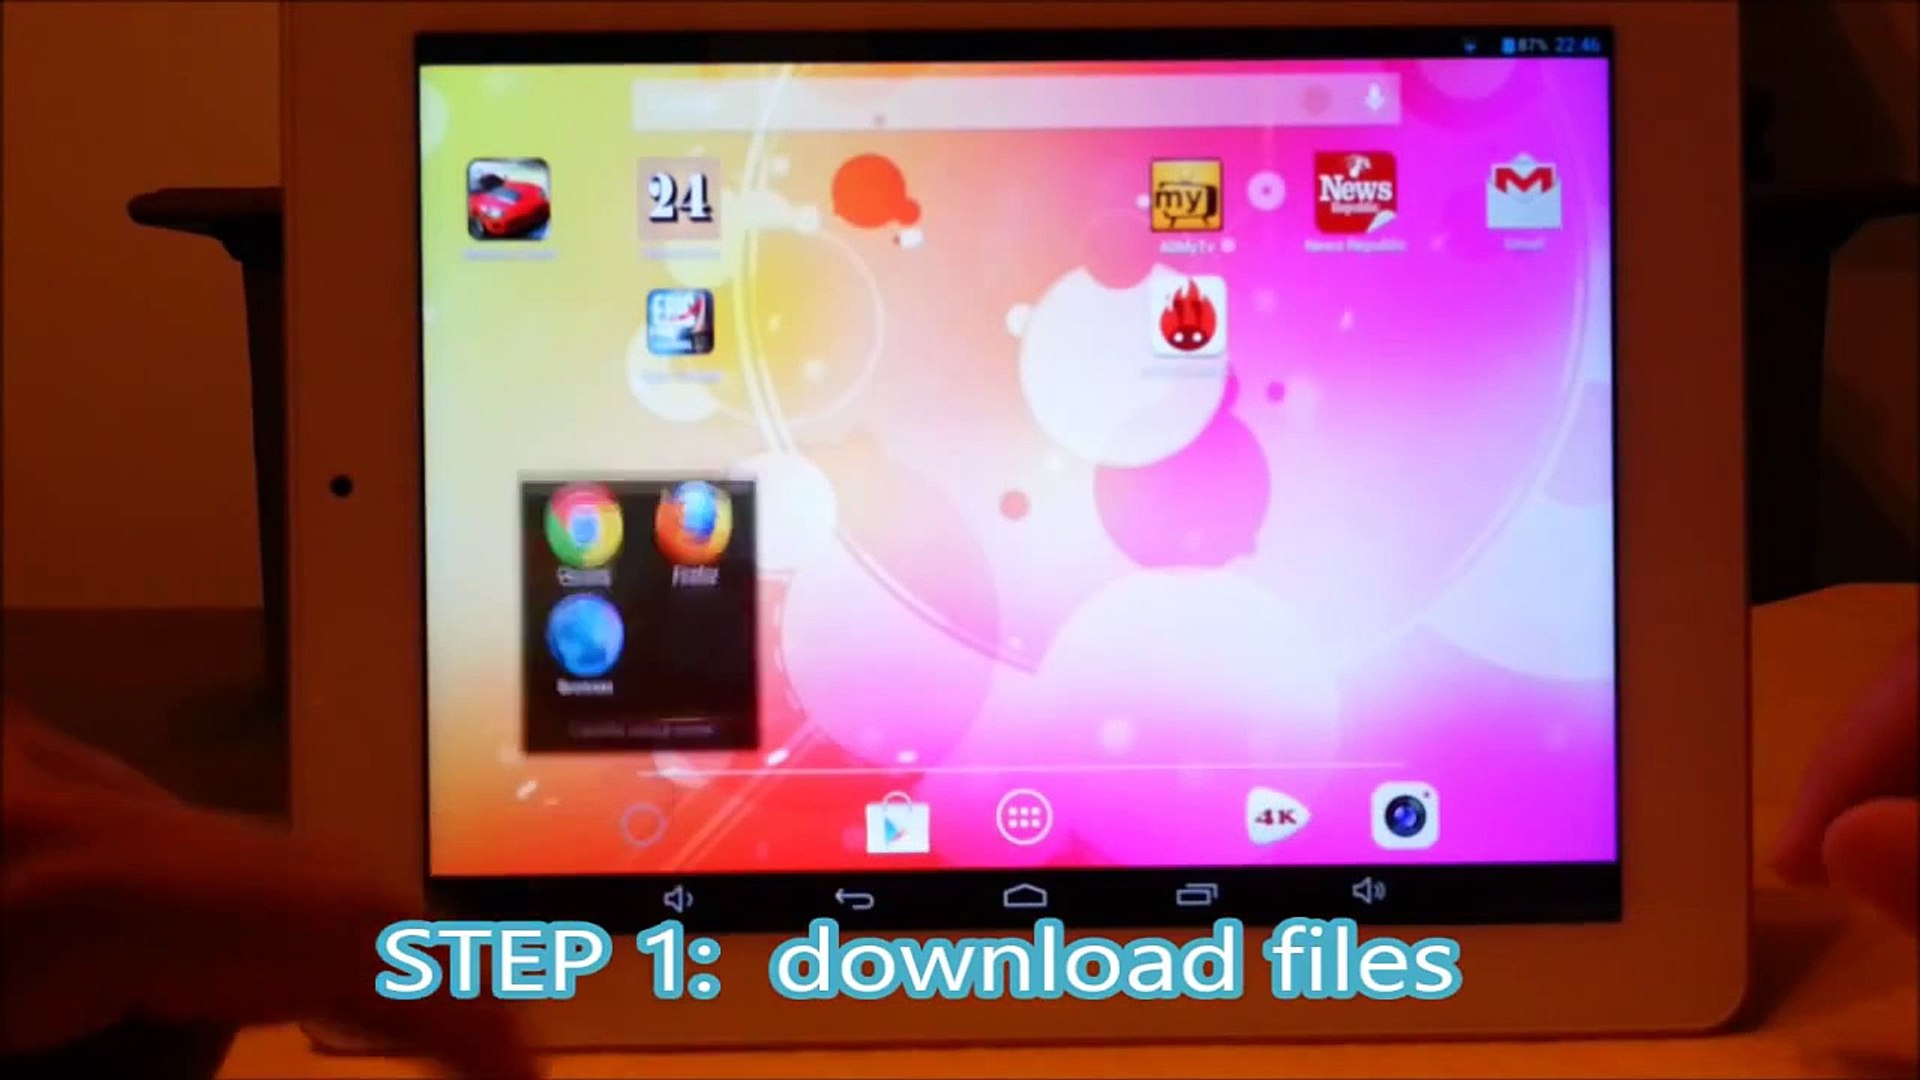 How install [ROM]CyanogenMod 10 1 on Onda v971/v972/v973 (Allwinner A31  devices)